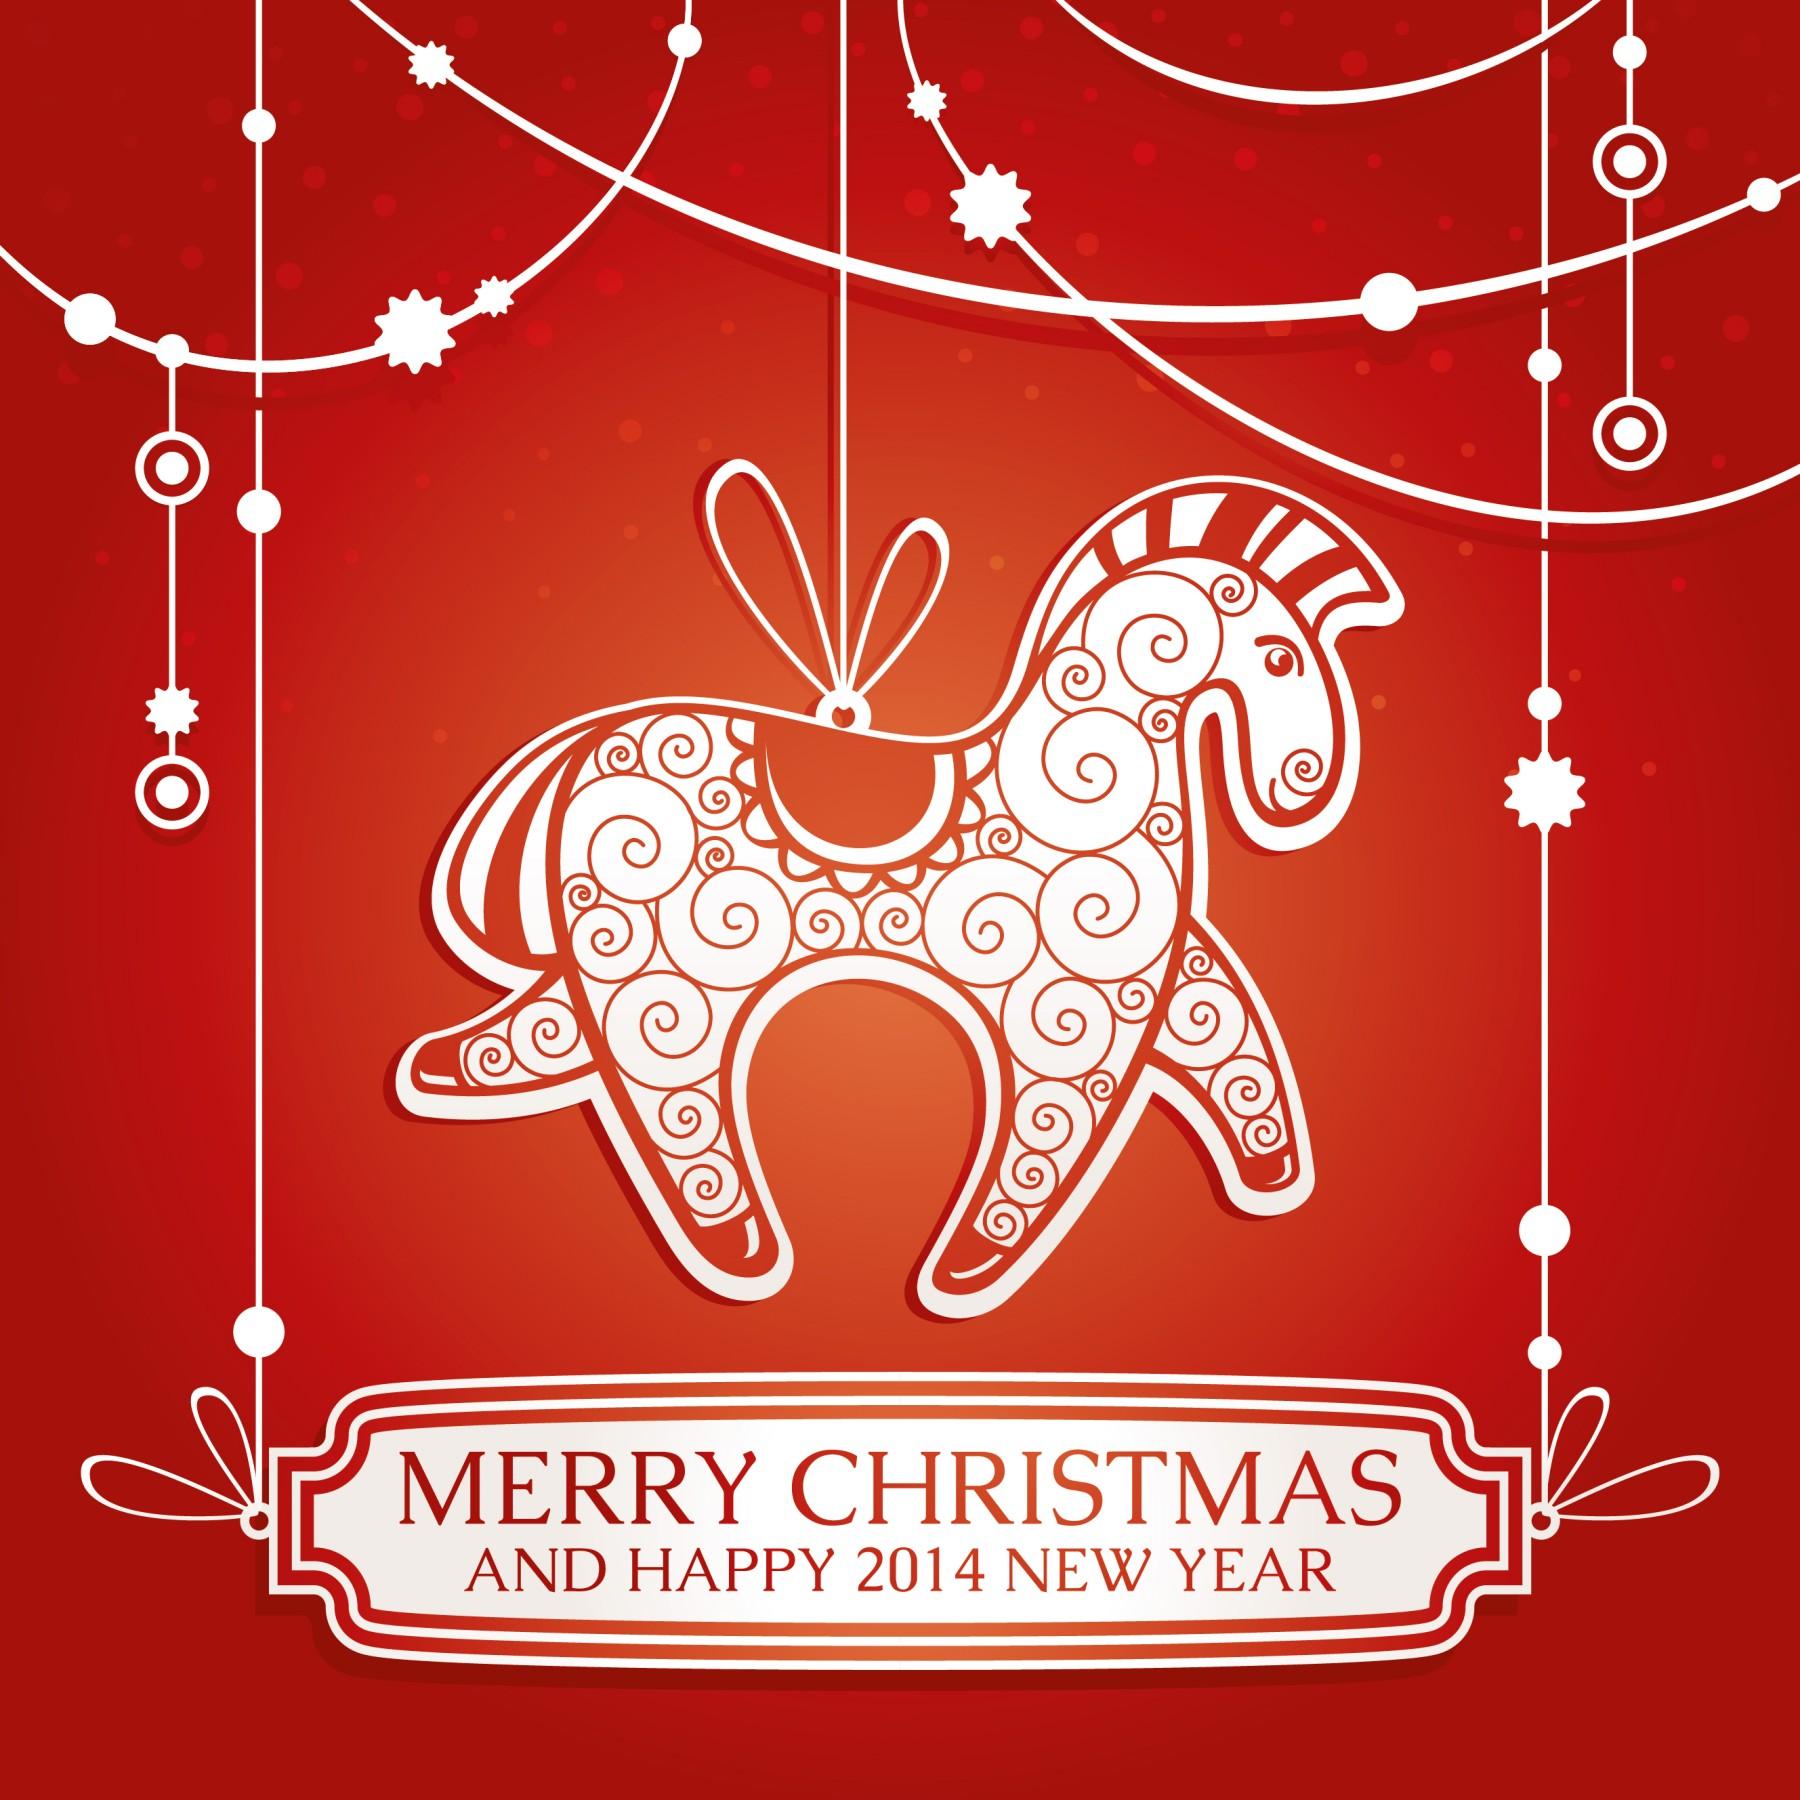 Merry christmas and happy new year ieee ukraine